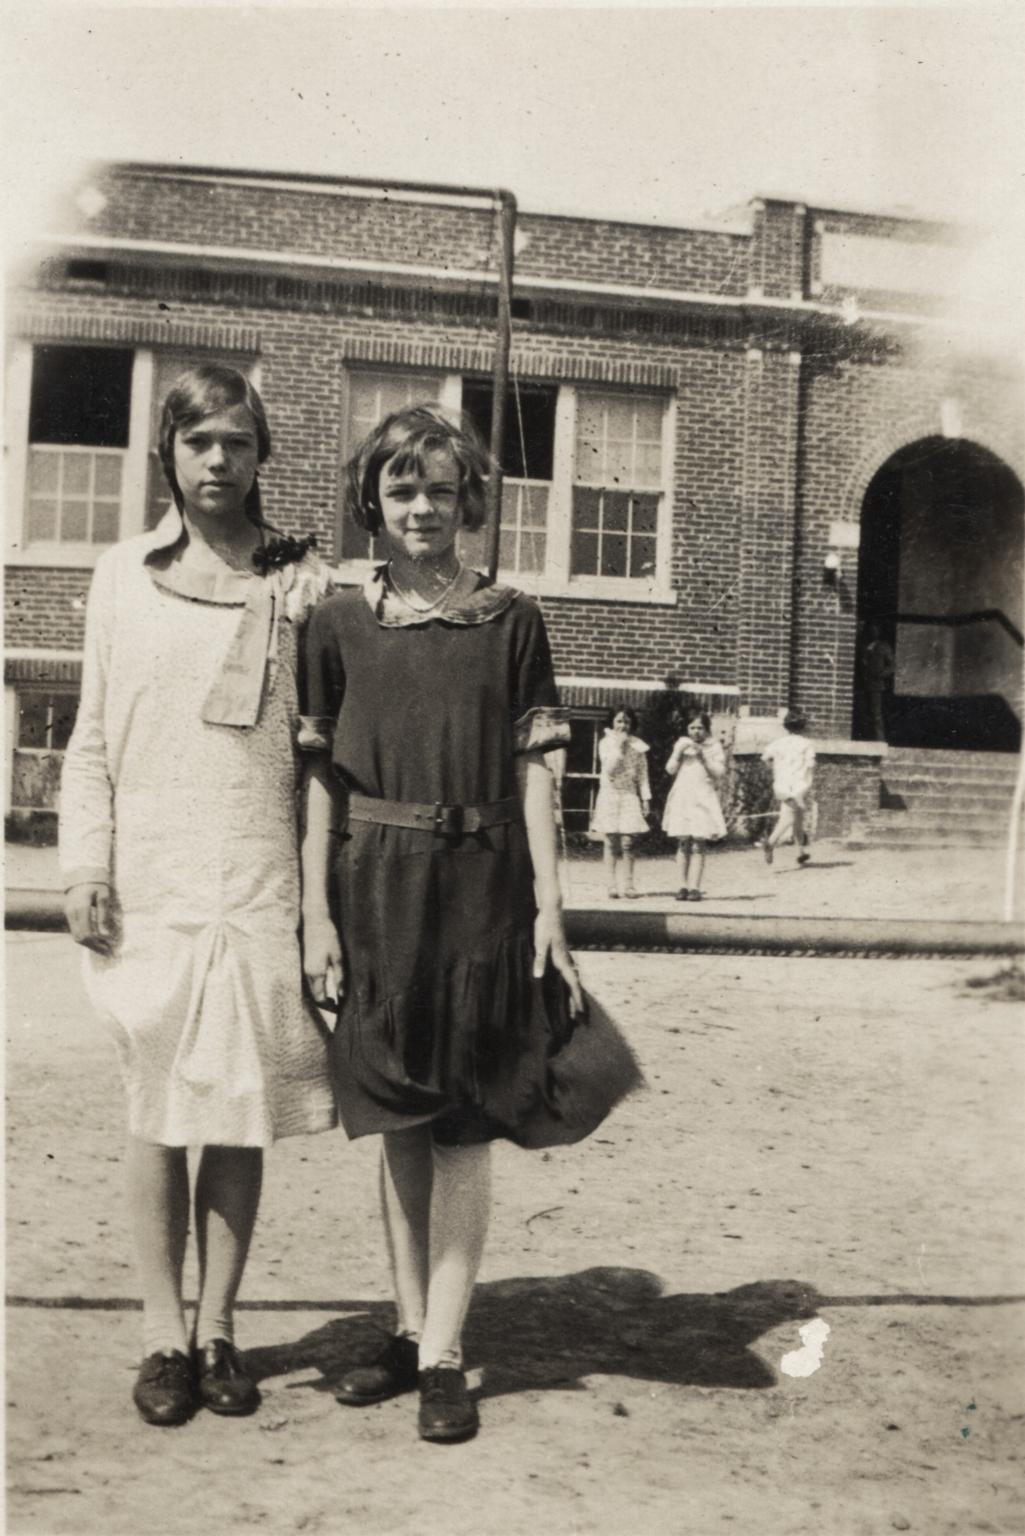 Frances Orr and Edna Marie Stewart